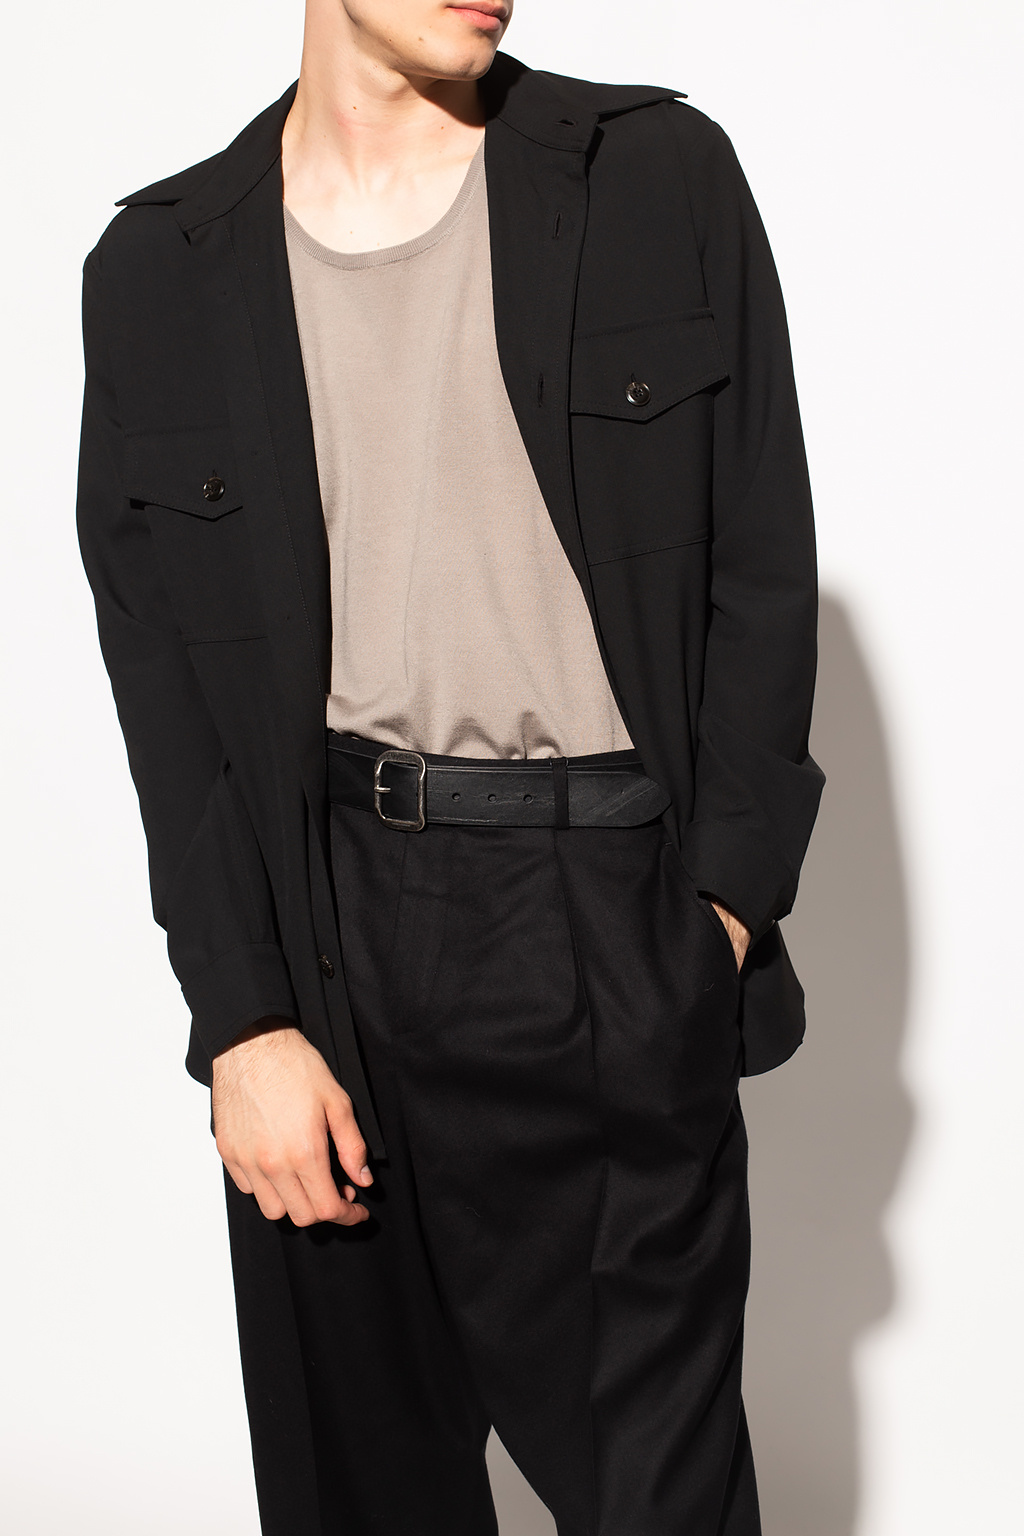 Nanushka Shirt with pockets